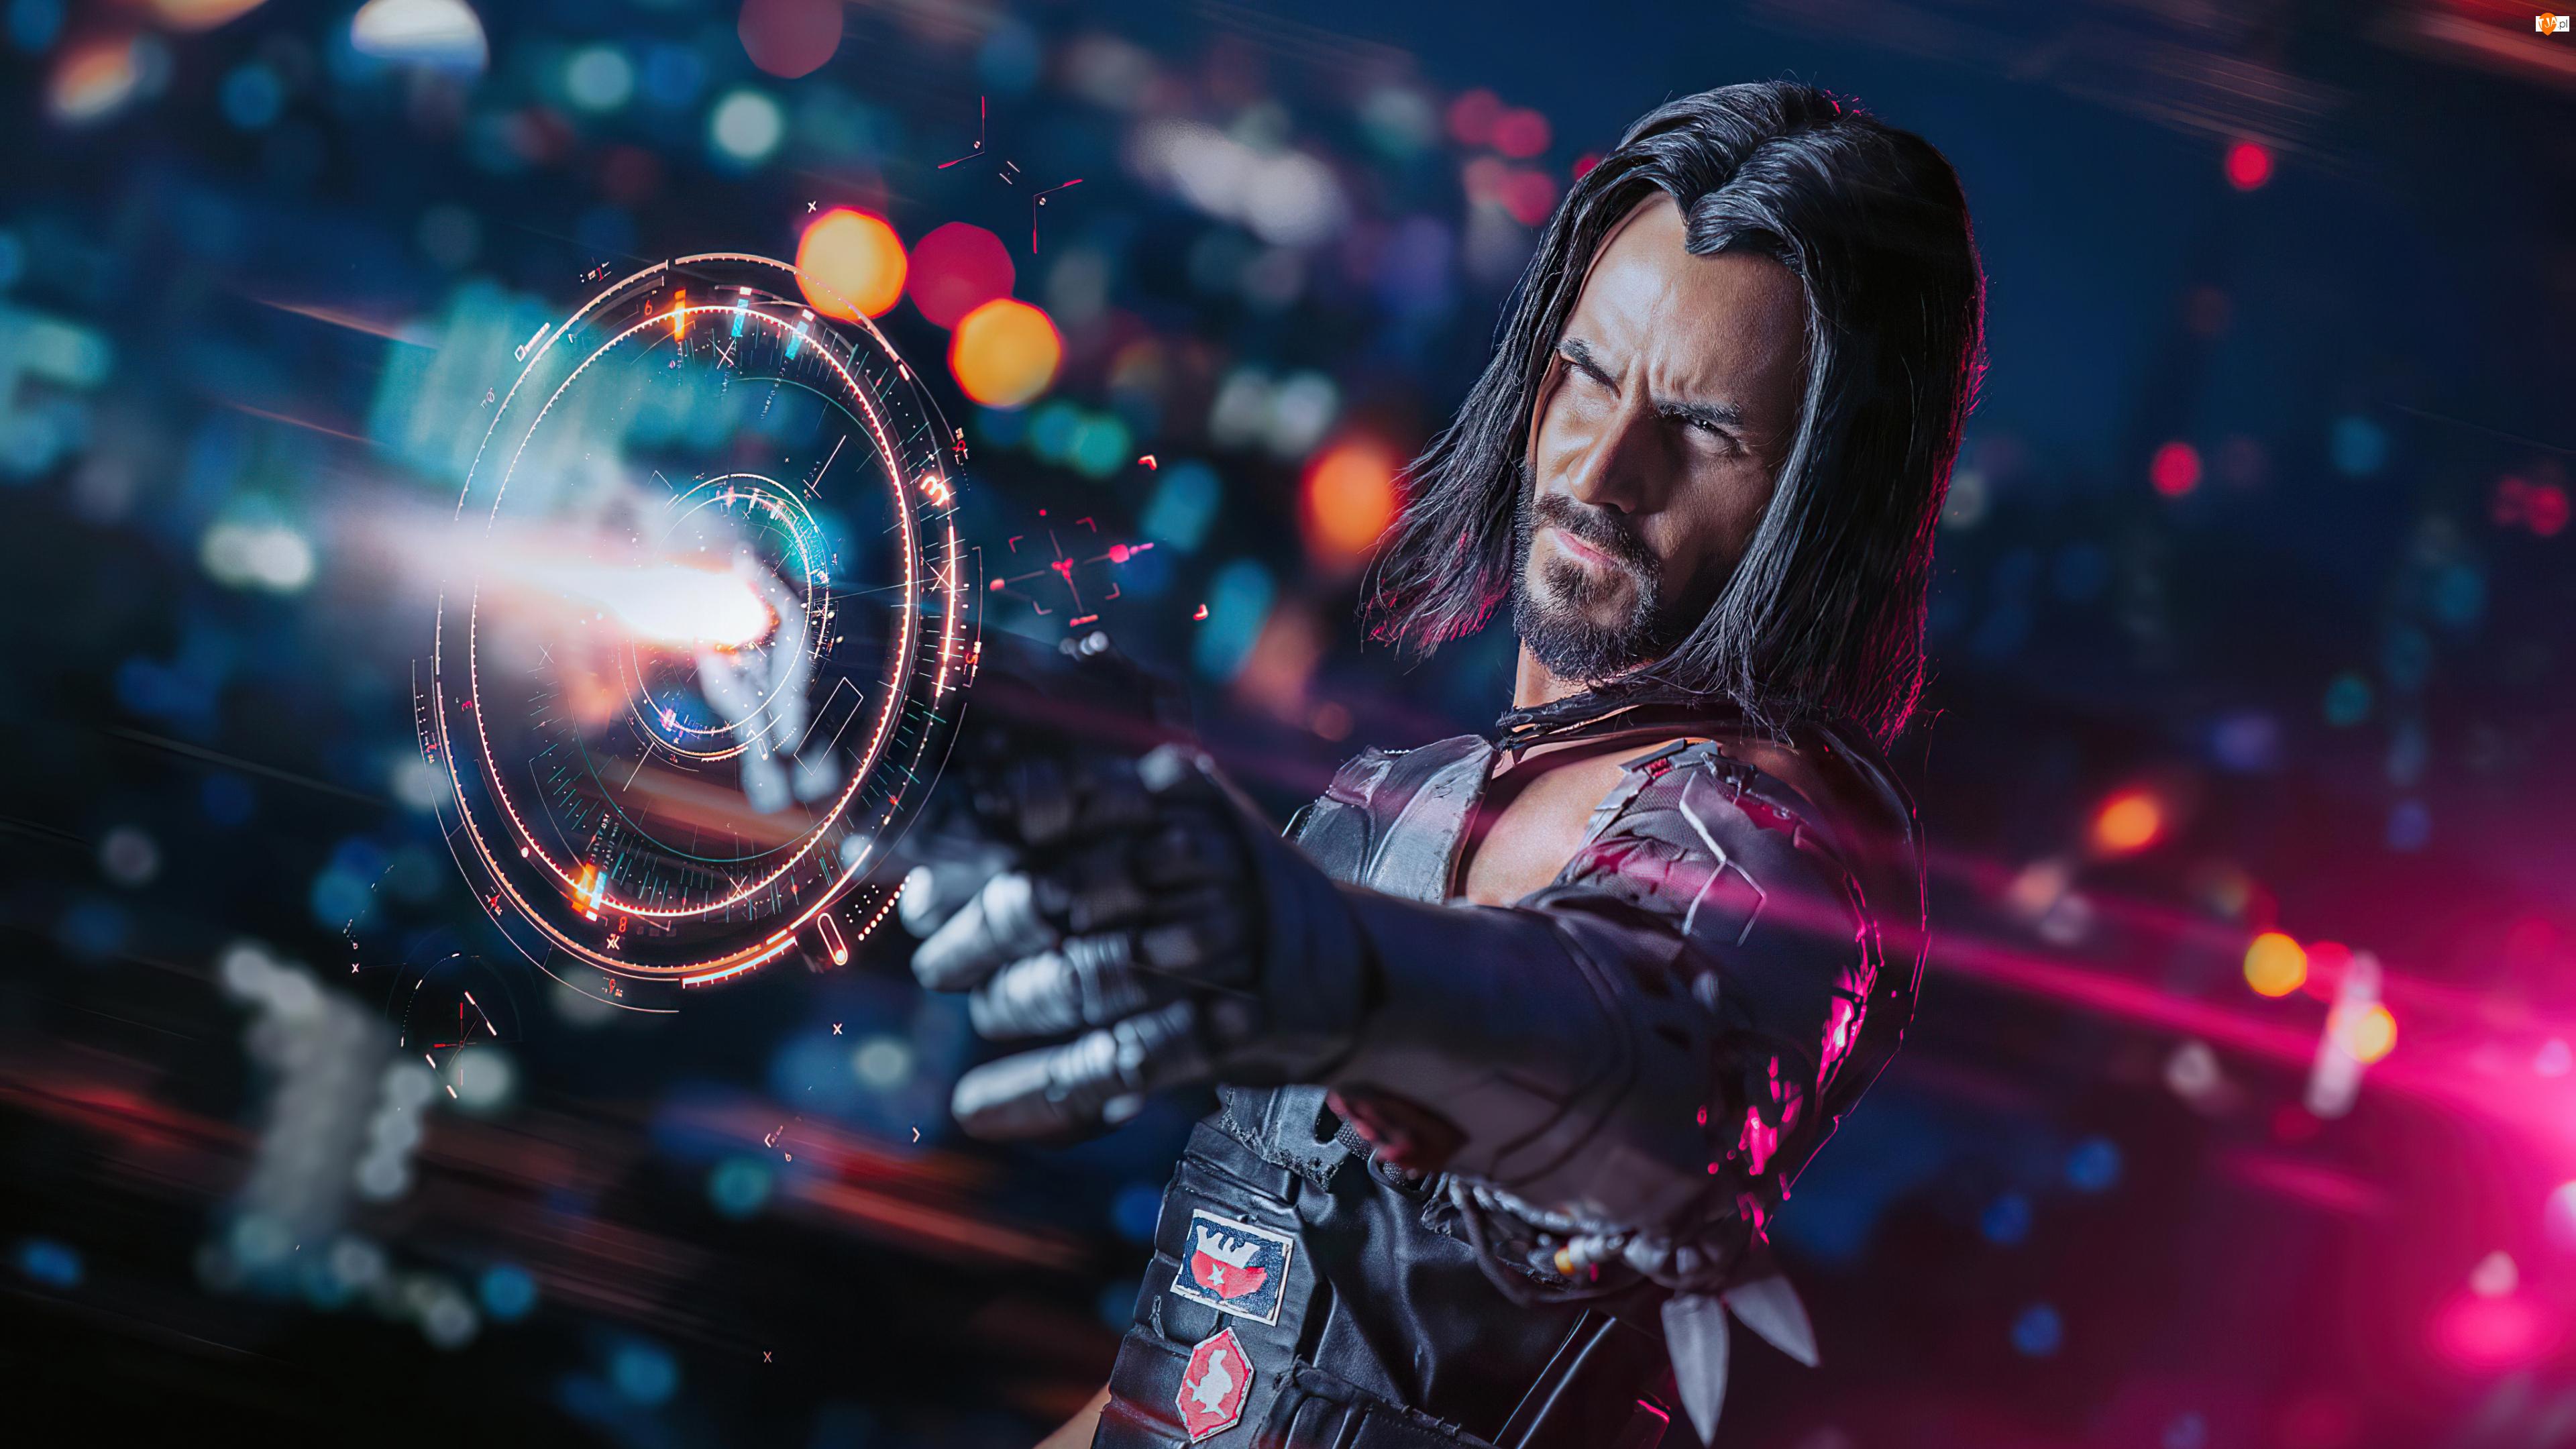 Cyberpunk 2077, Gra, Johnny Silverhand, Aktor, Postać, Keanu Reeves